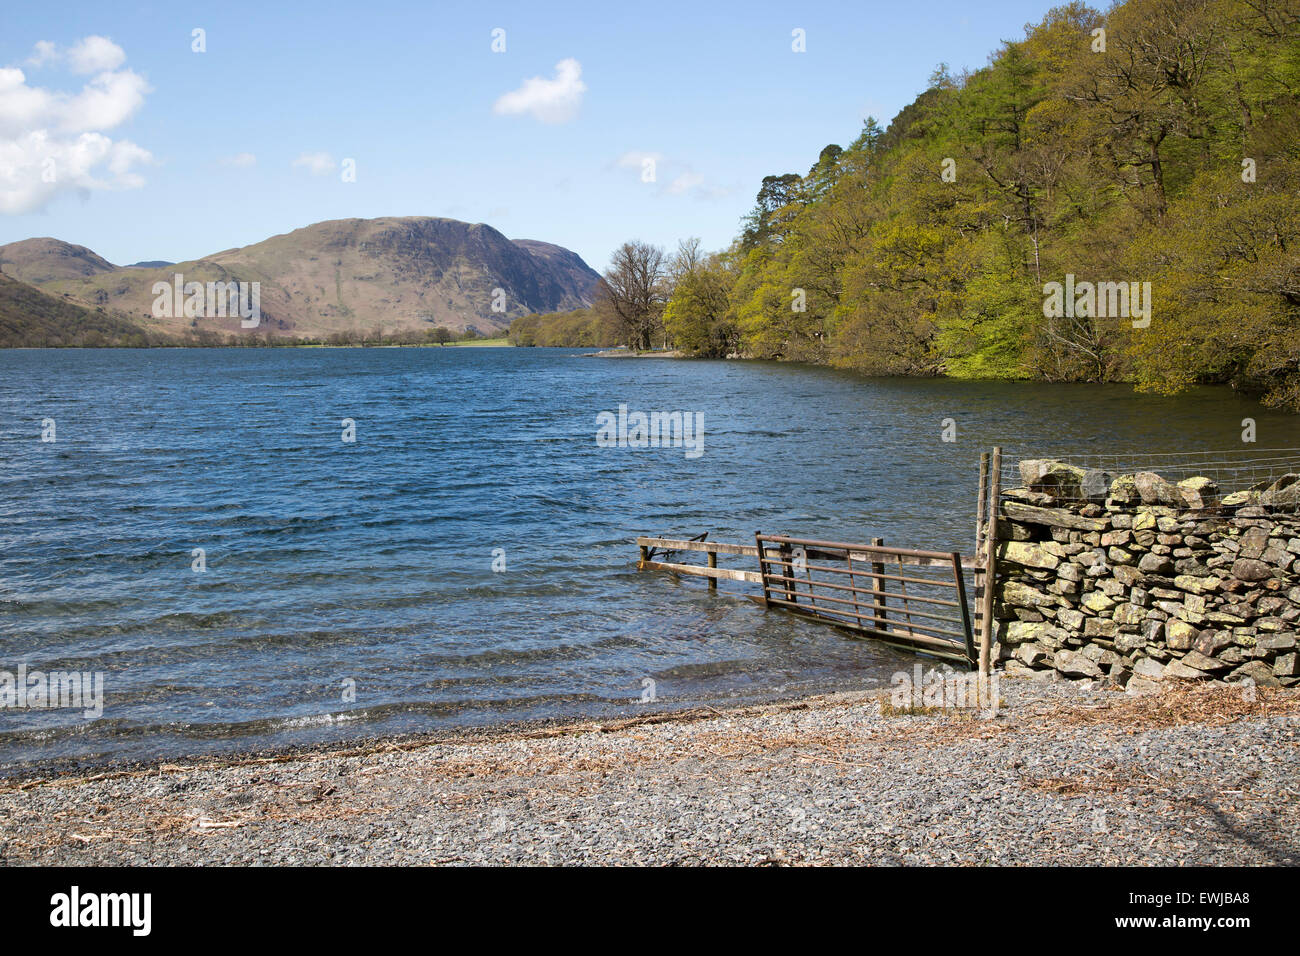 Con vistas al paisaje del lago Buttermere, Cumbria, Inglaterra, Reino Unido. Imagen De Stock